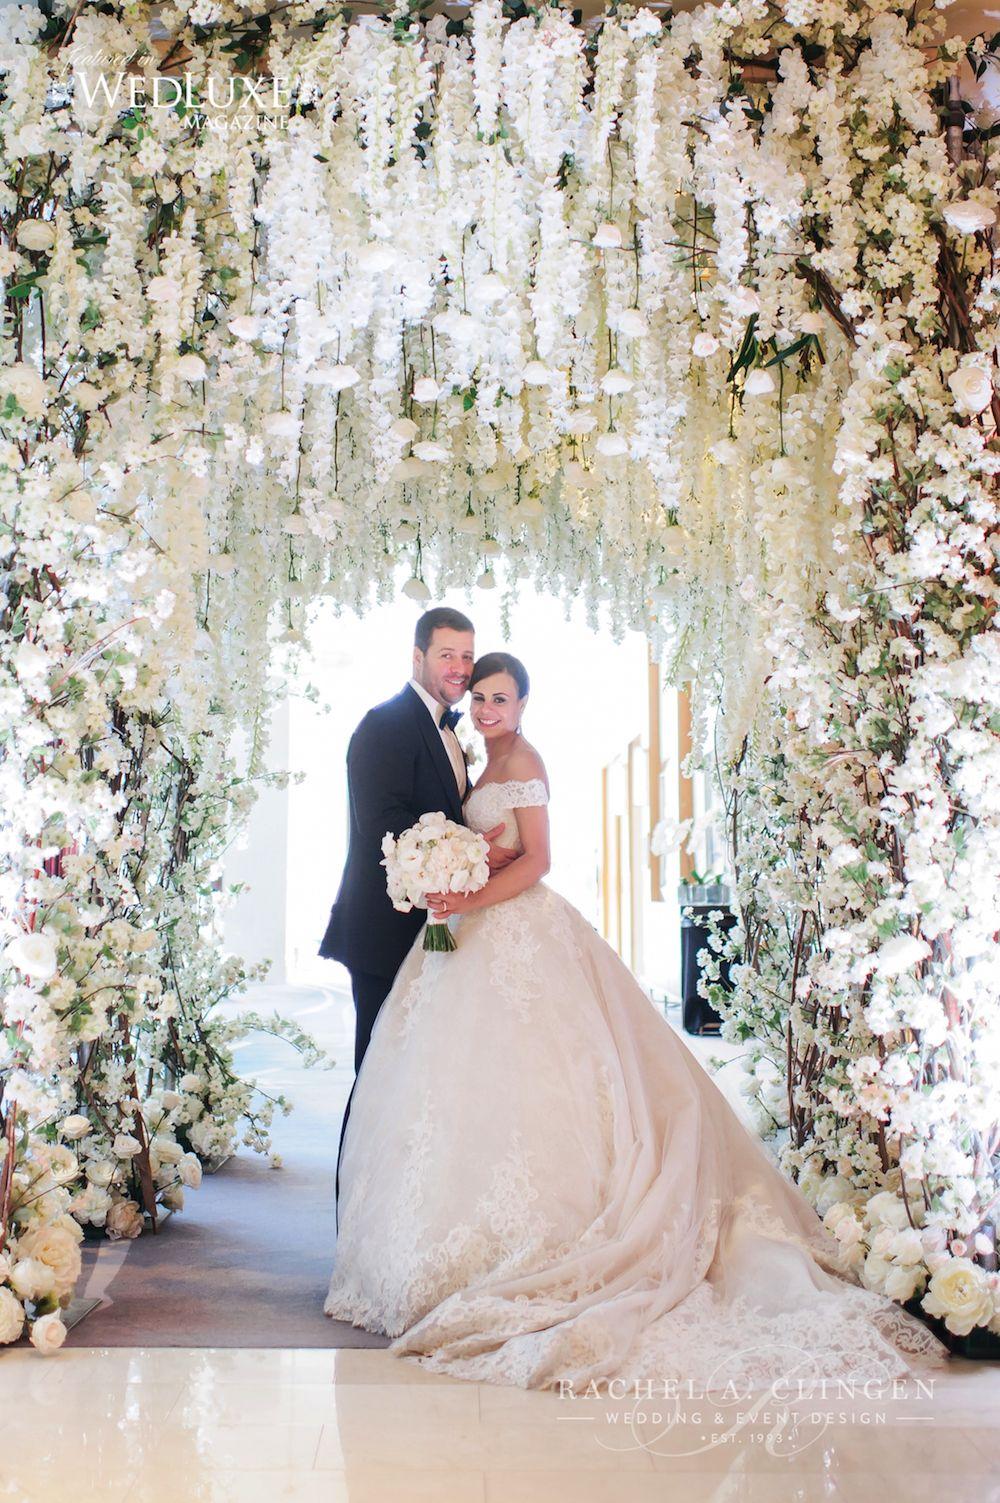 A stunning all white wedding at the ritz carlton toronto wedding a stunning all white wedding at the ritz carlton toronto wedding decor toronto rachel a junglespirit Images